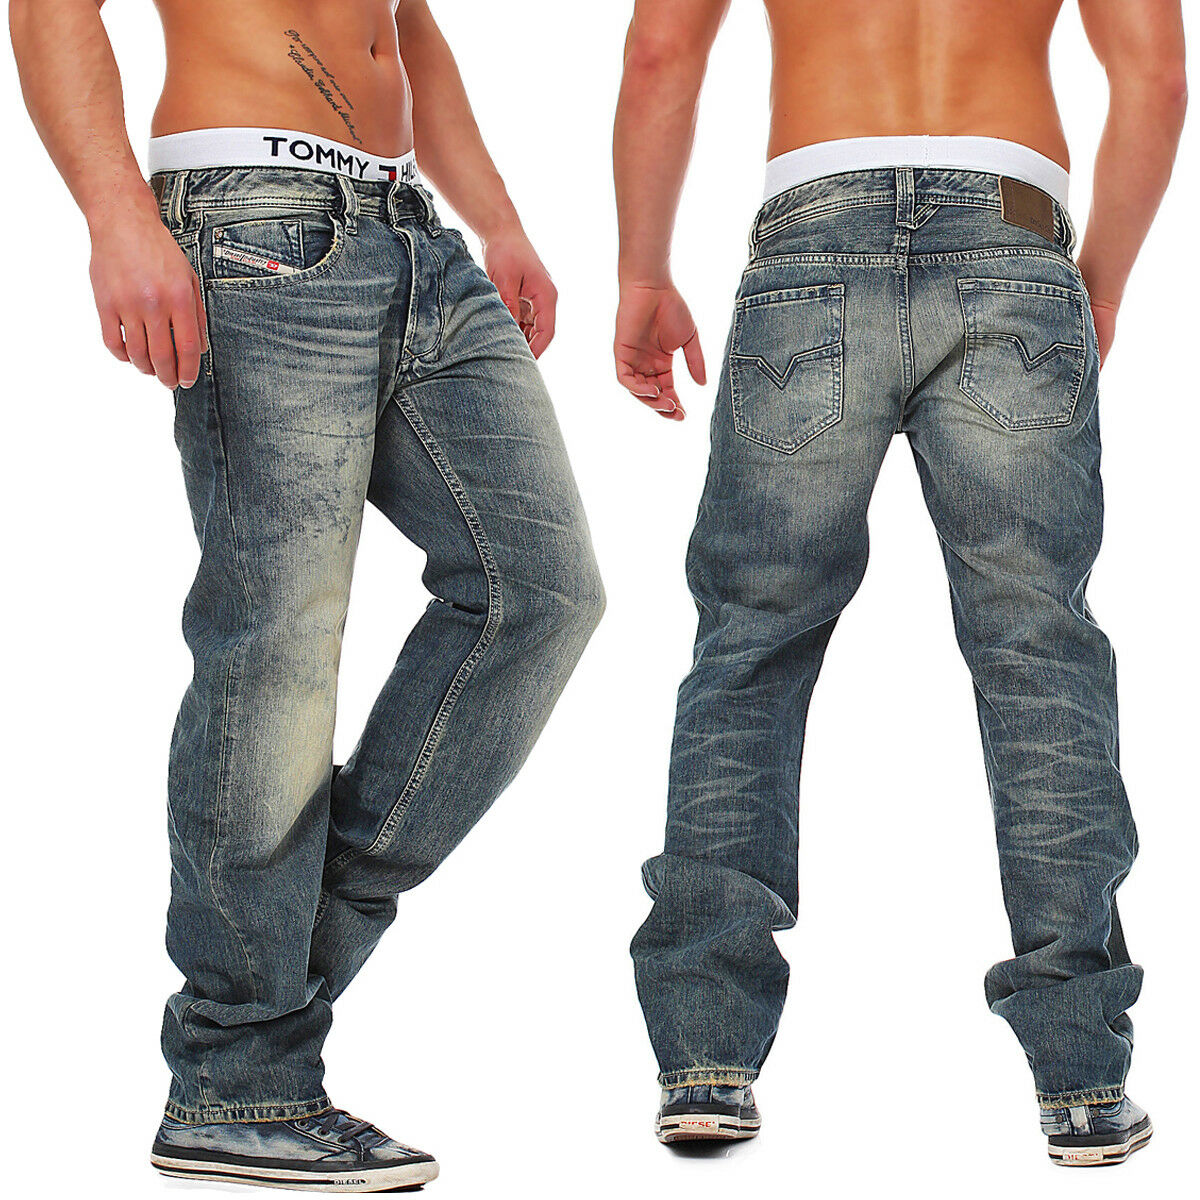 85ea35c8910a JEANS DIESEL 0828d 828d Uomo Regular Straight DNA Collezione Larkee  mutazione npjvop4408-Jeans